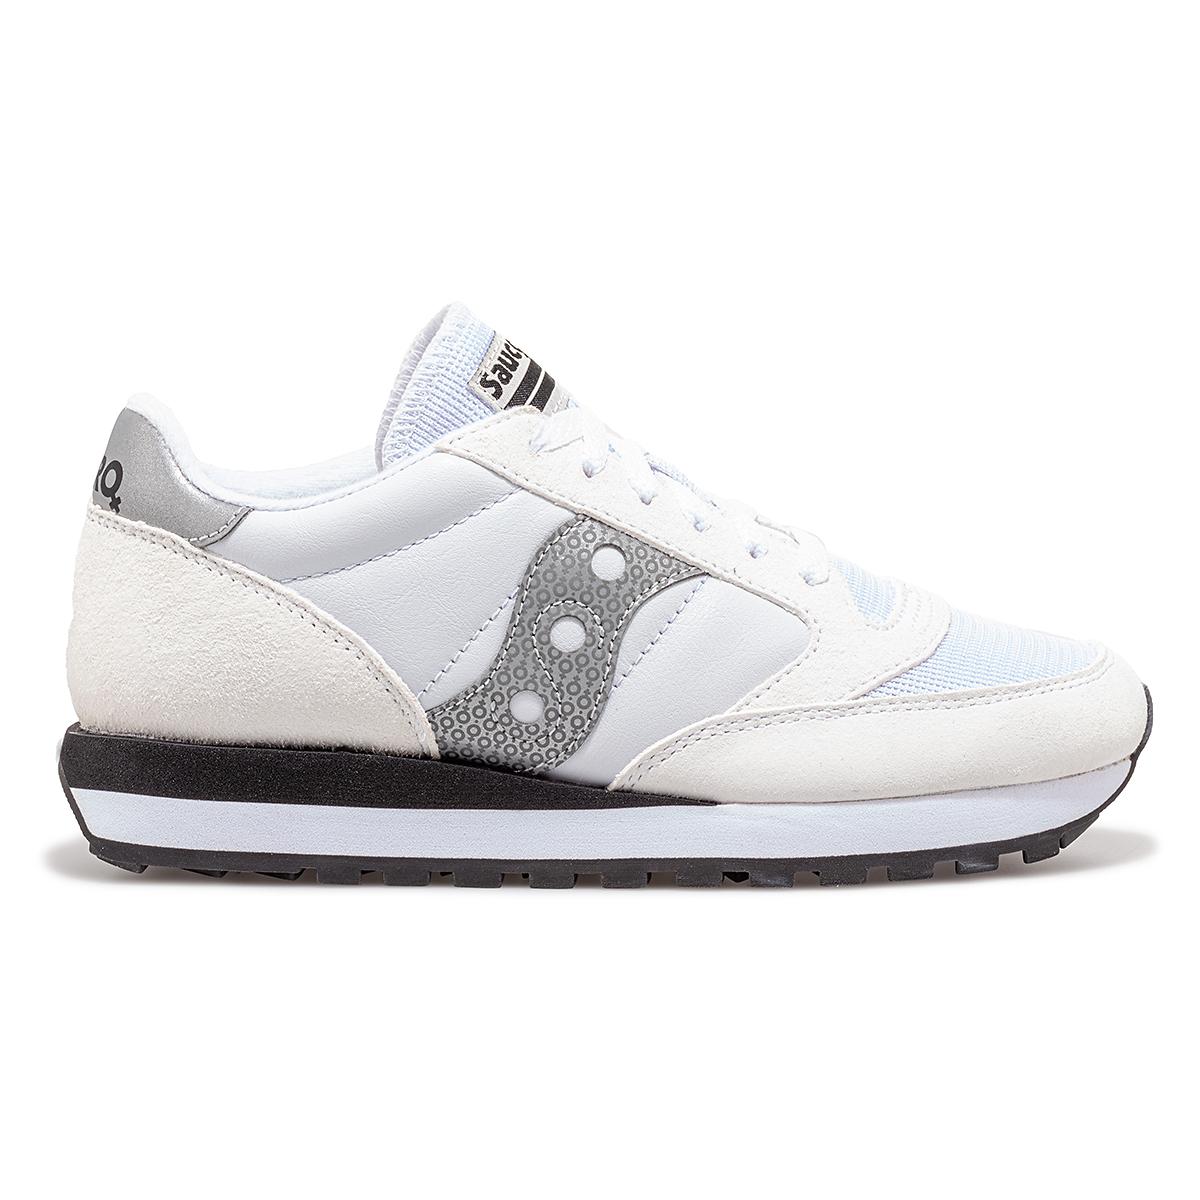 Saucony x Prinkshop Hero Original Jazz Vintage Running Shoe - Color: Hero Black/White - Size: M5/W6.5 - Width: Regular, Hero Black/White, large, image 1